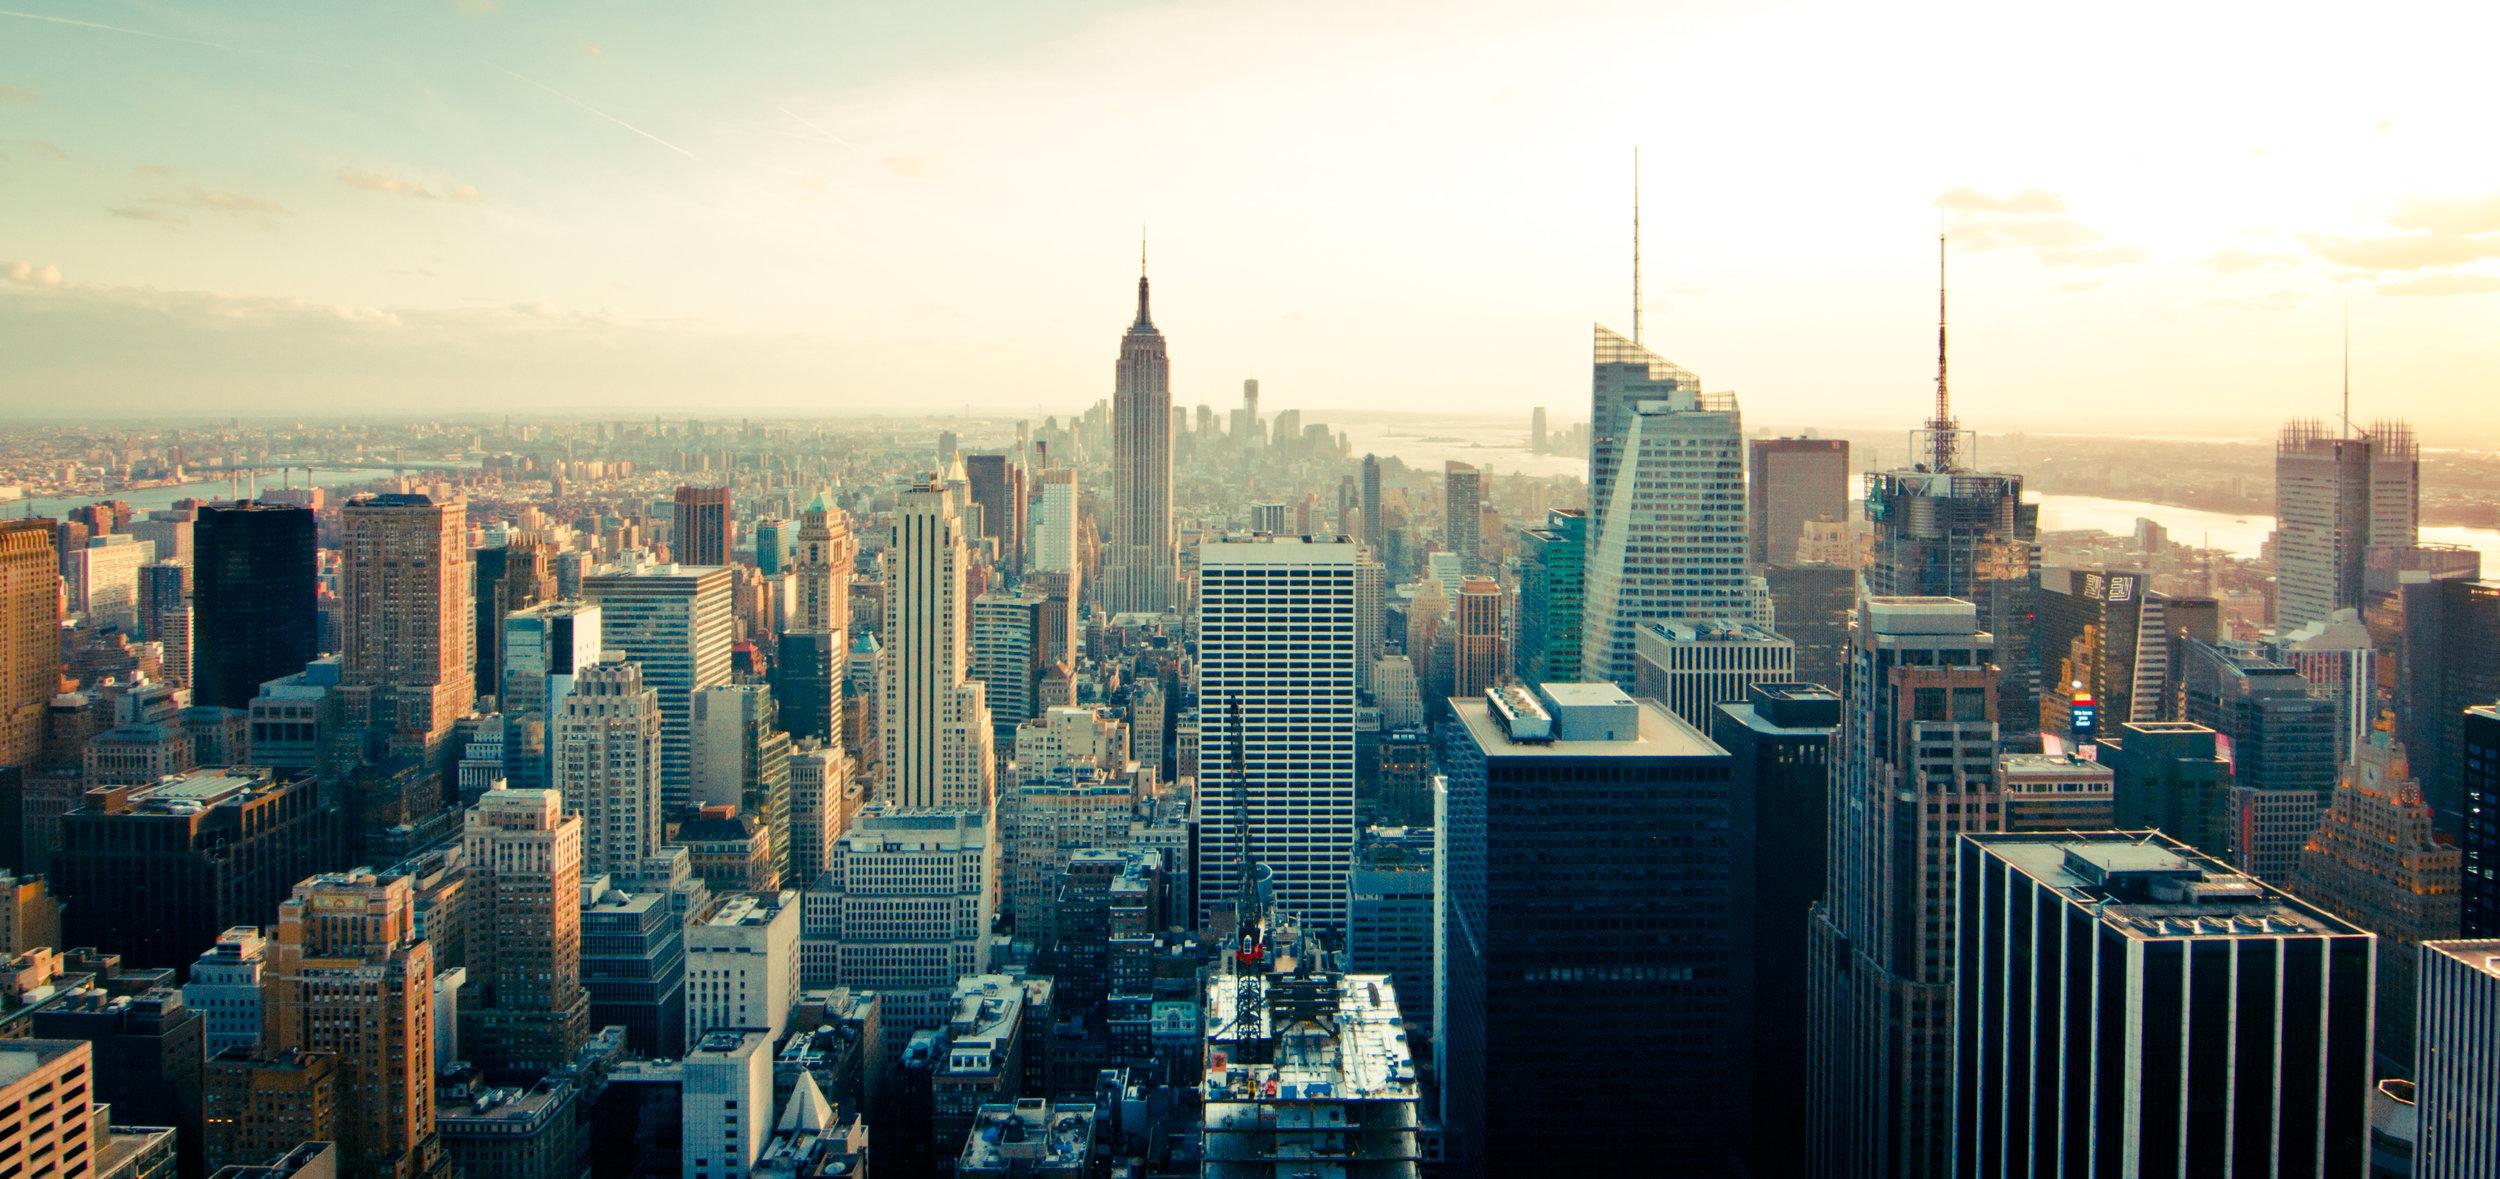 Image: Pexels.com / CC0 License